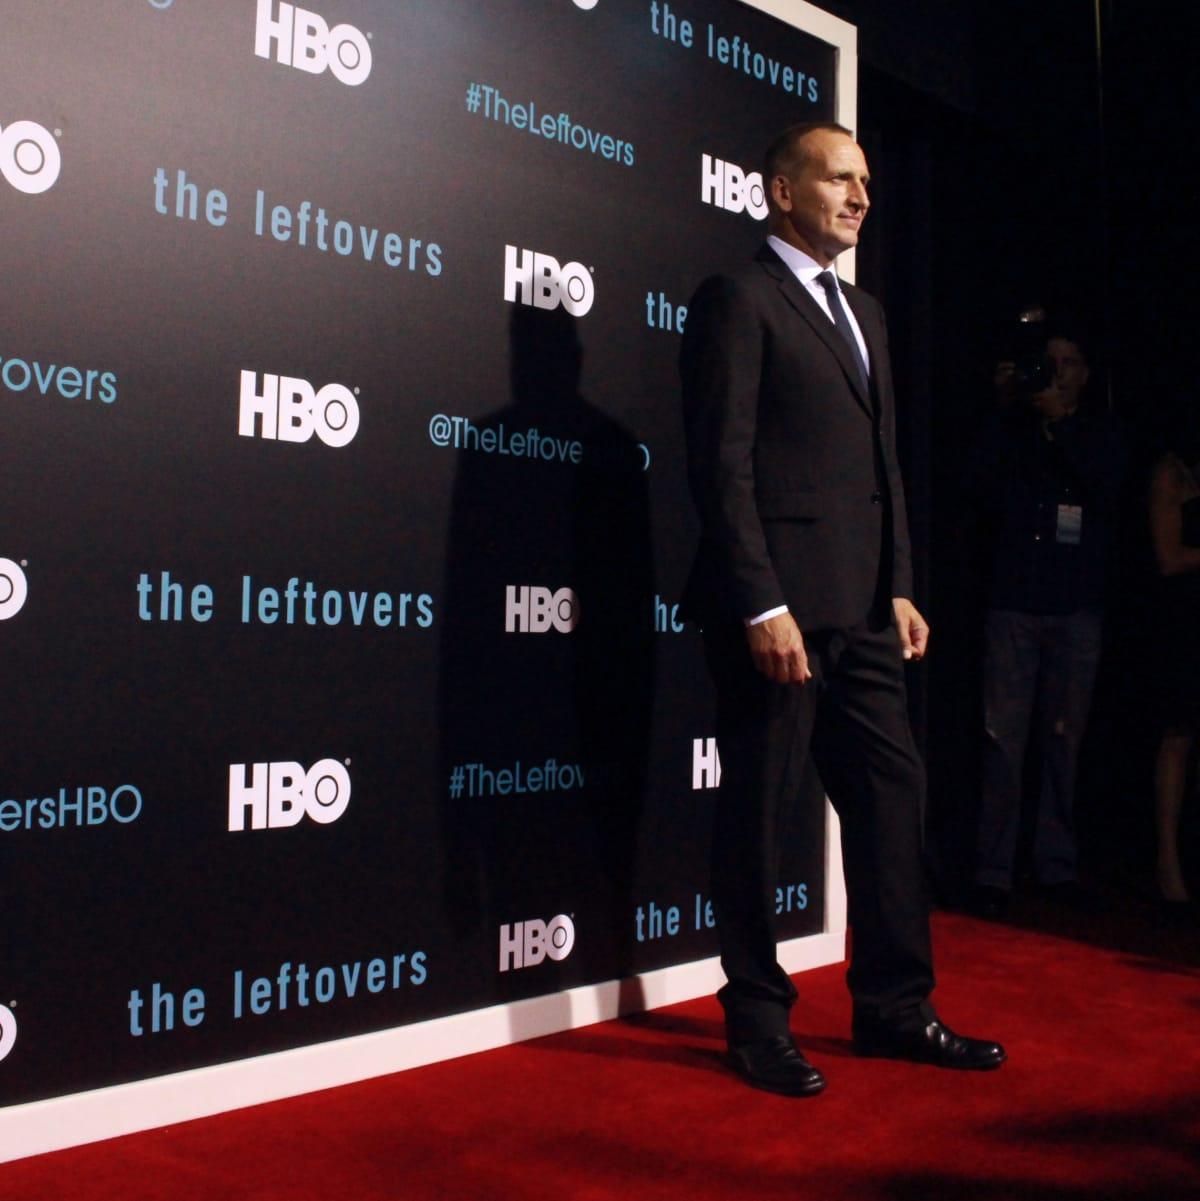 The Leftovers HBO Season 2 red carpet premiere Christopher Eccleston October 2015